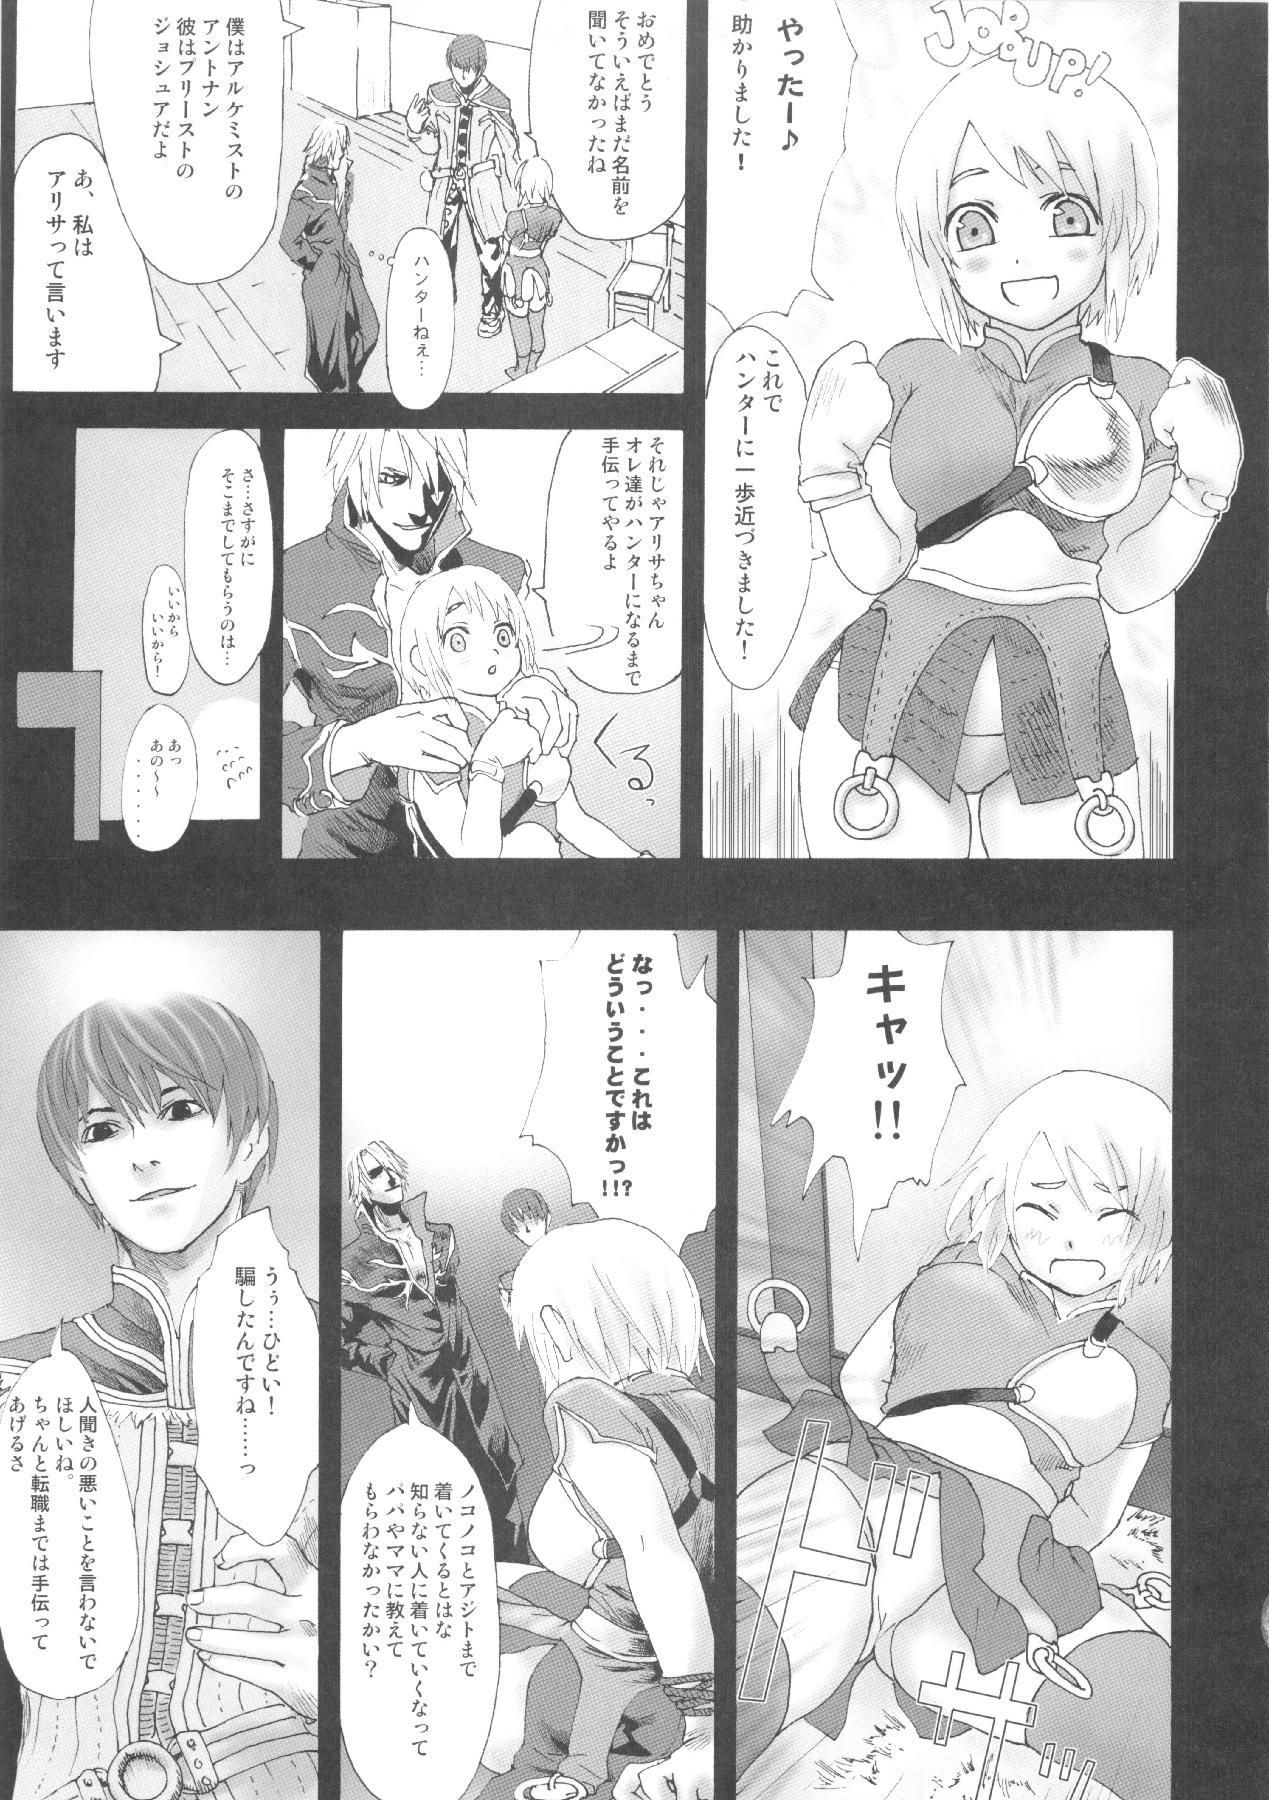 (C83) [Fatalpulse (Asanagi)] VictimGirls Compiled Vol.1 -Victimgirls Soushuuhen 1- MMO Game Selection (Various) 57